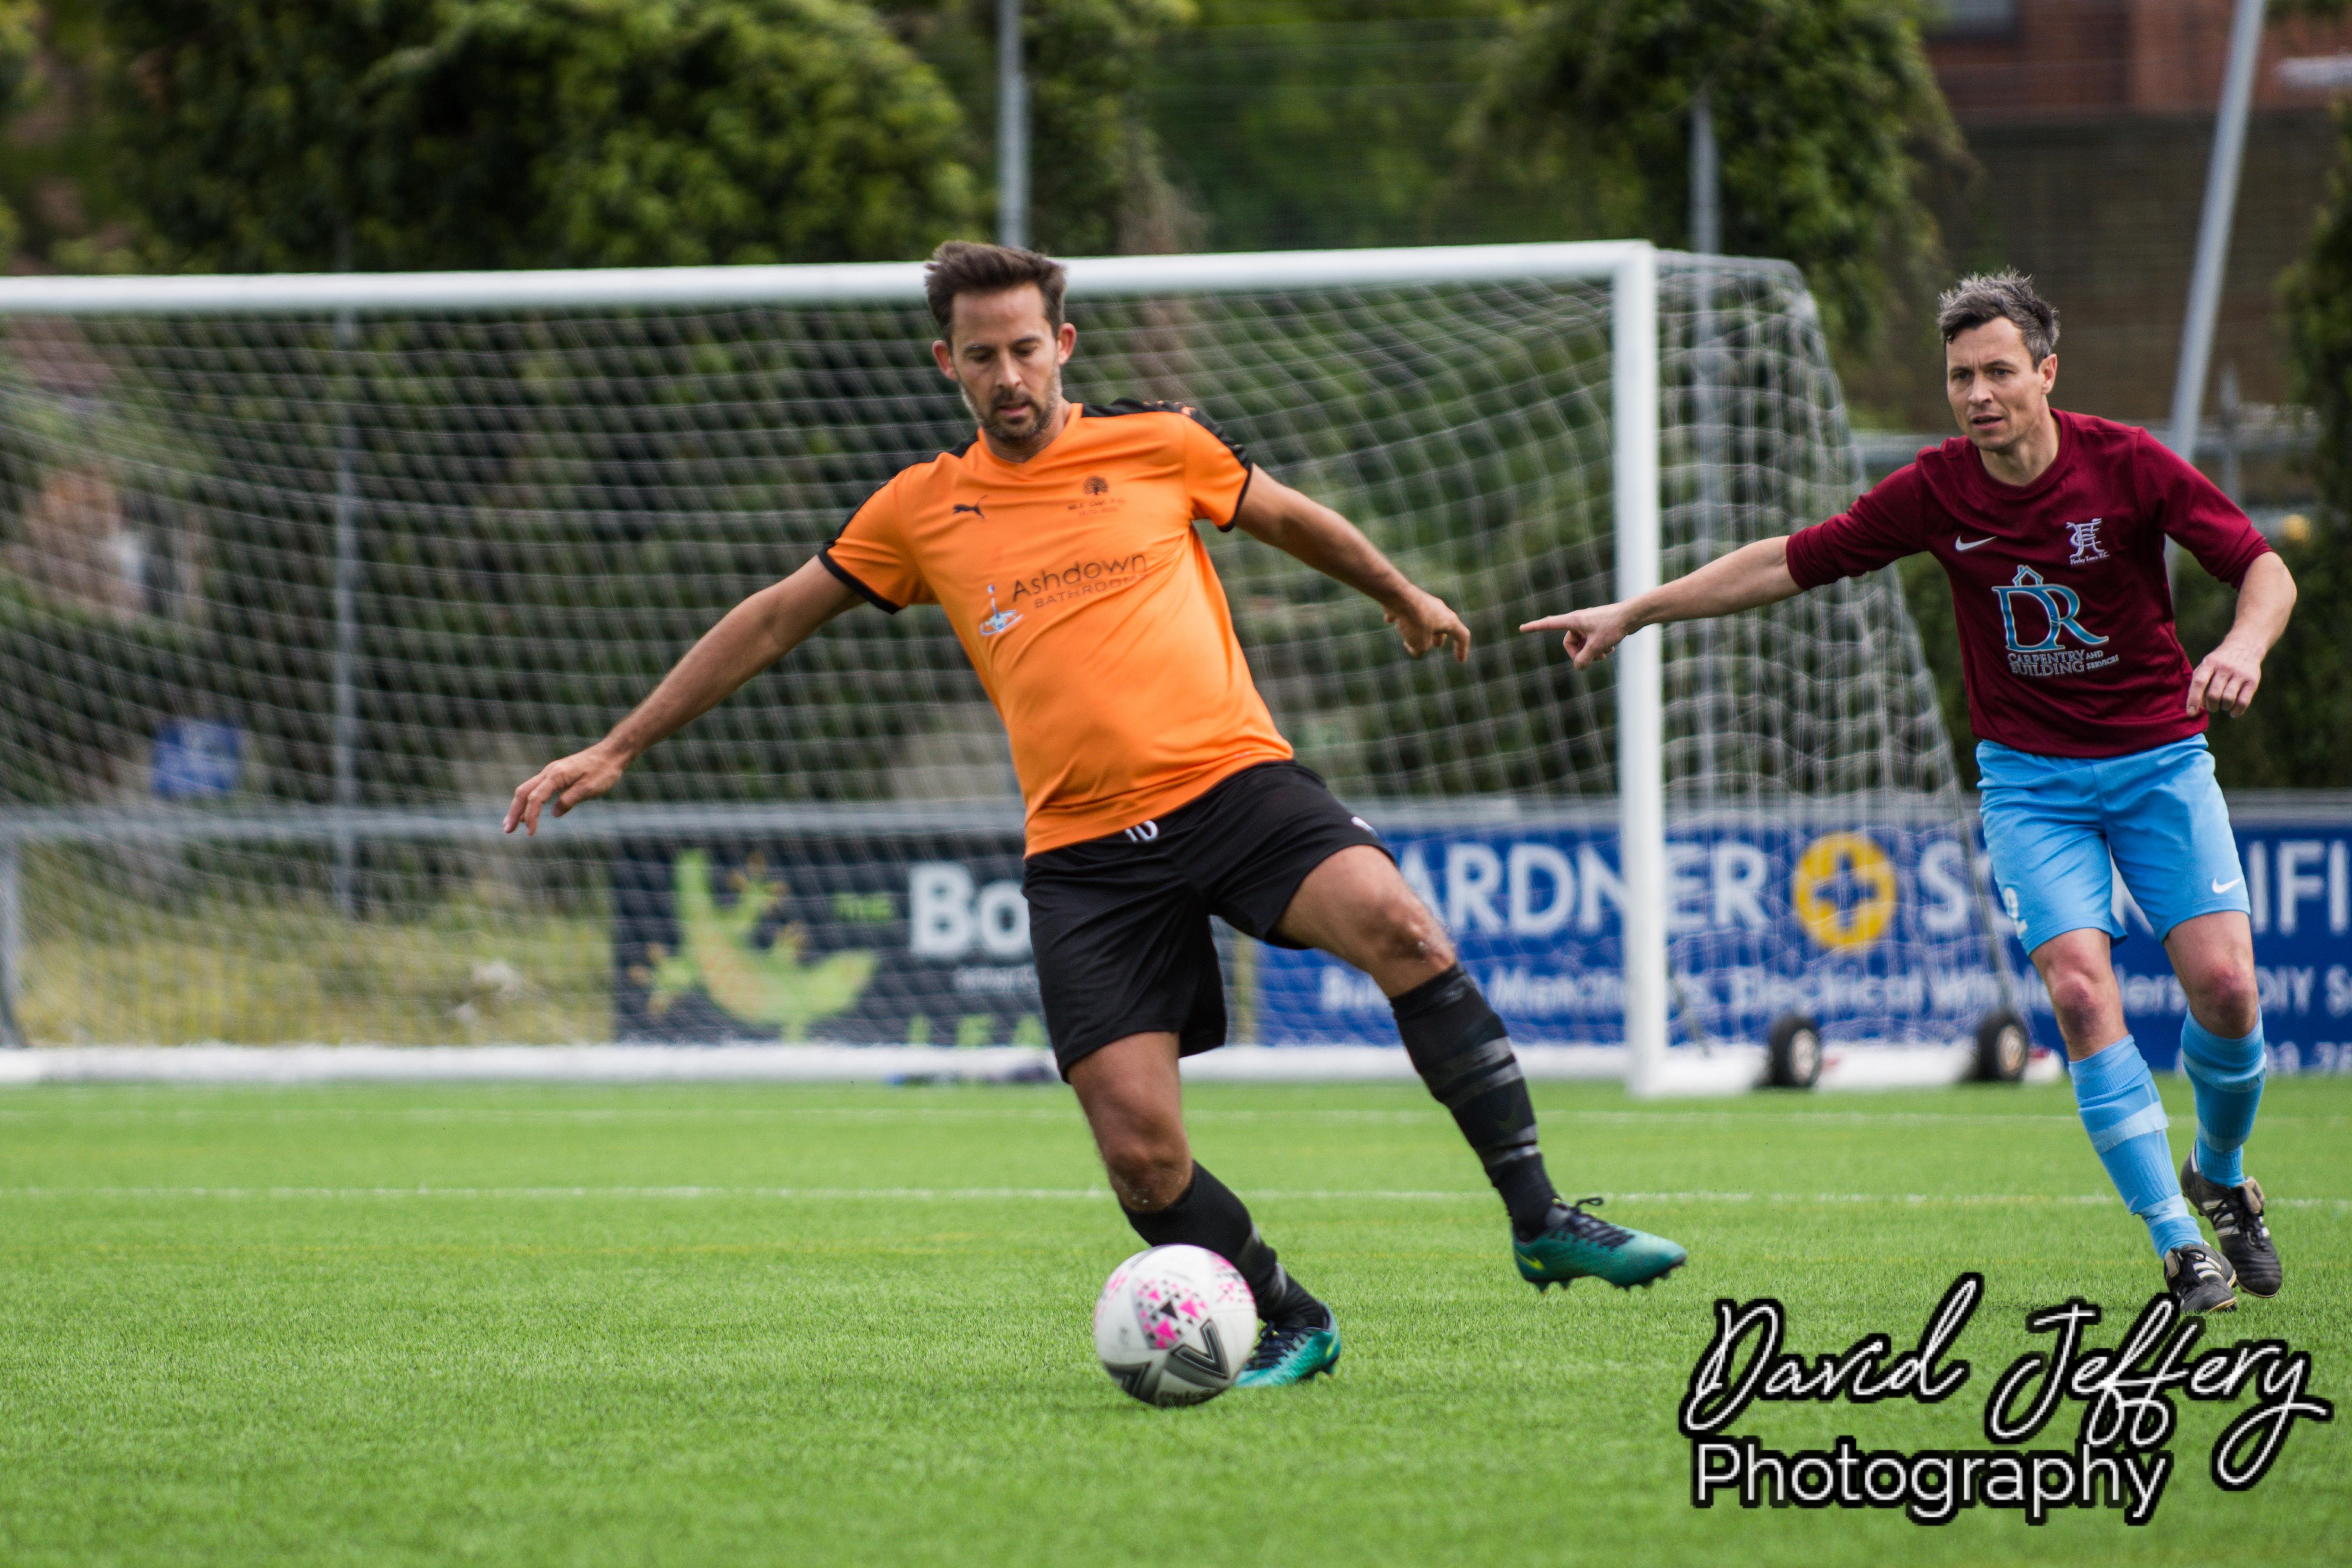 079 MOFC Vets vs Horl Vets 05.05